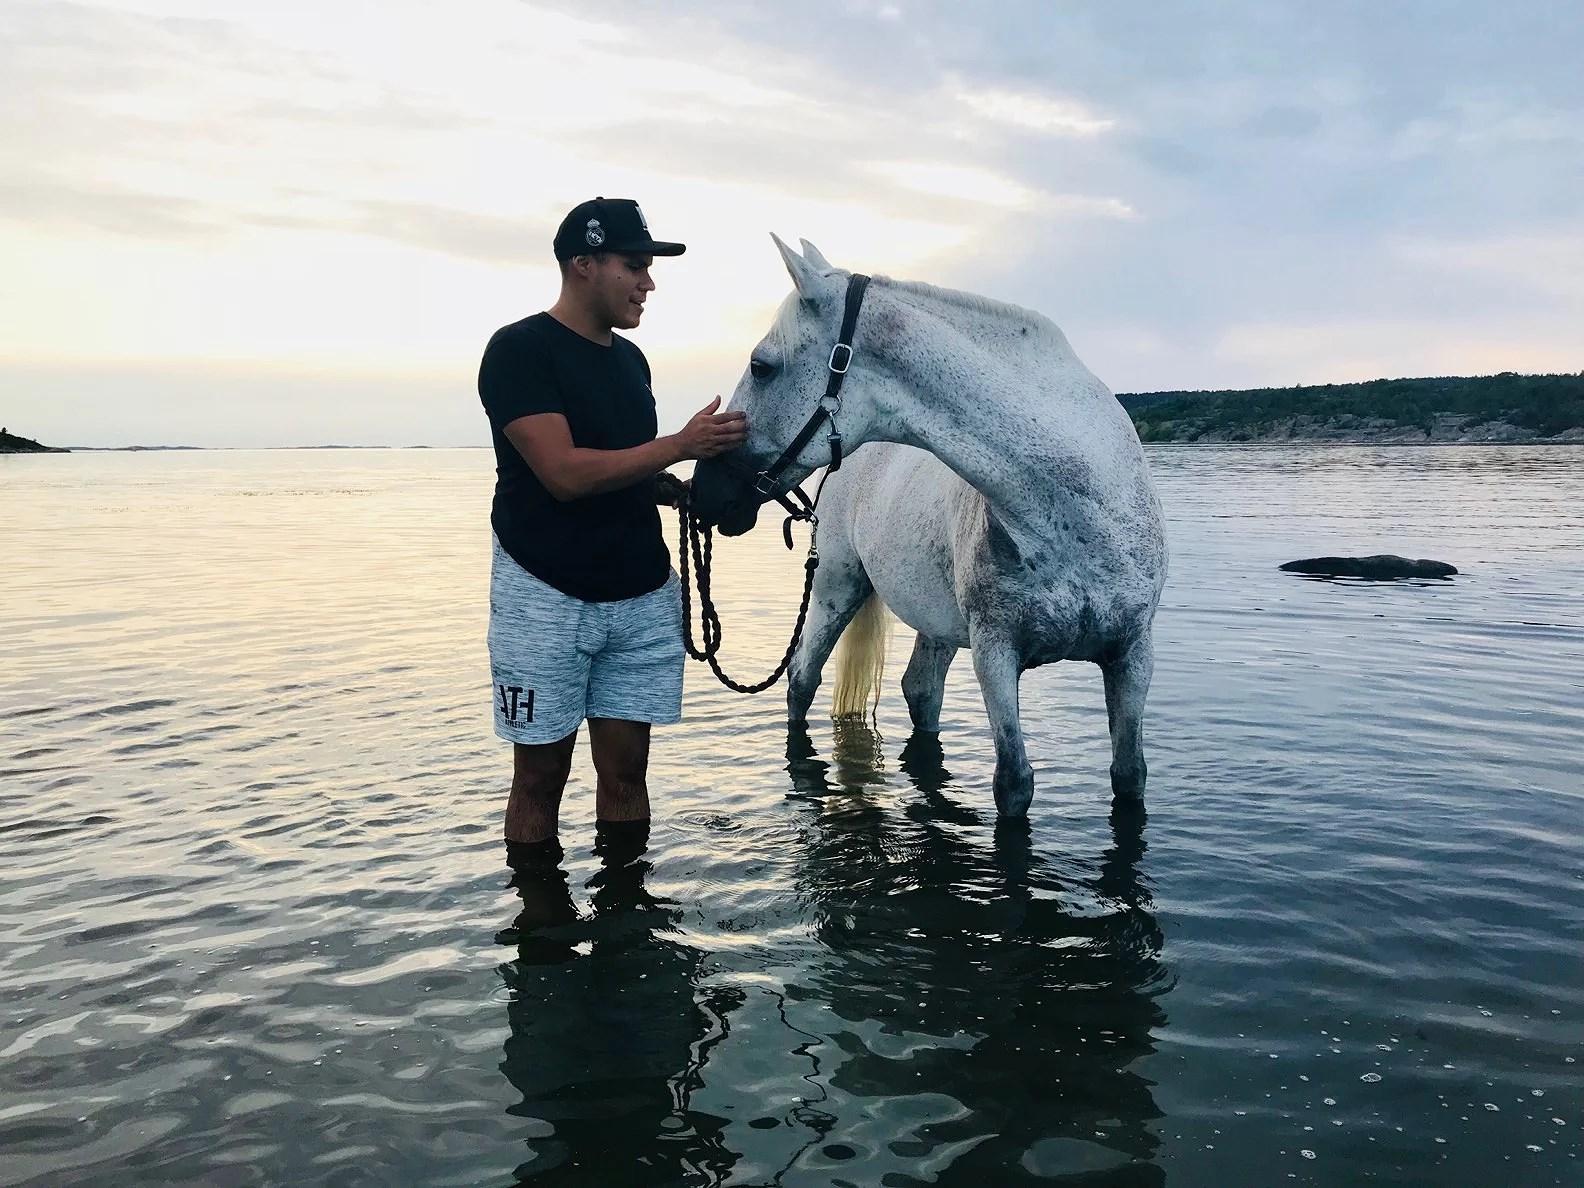 Idag plaskade vi i vattnet!